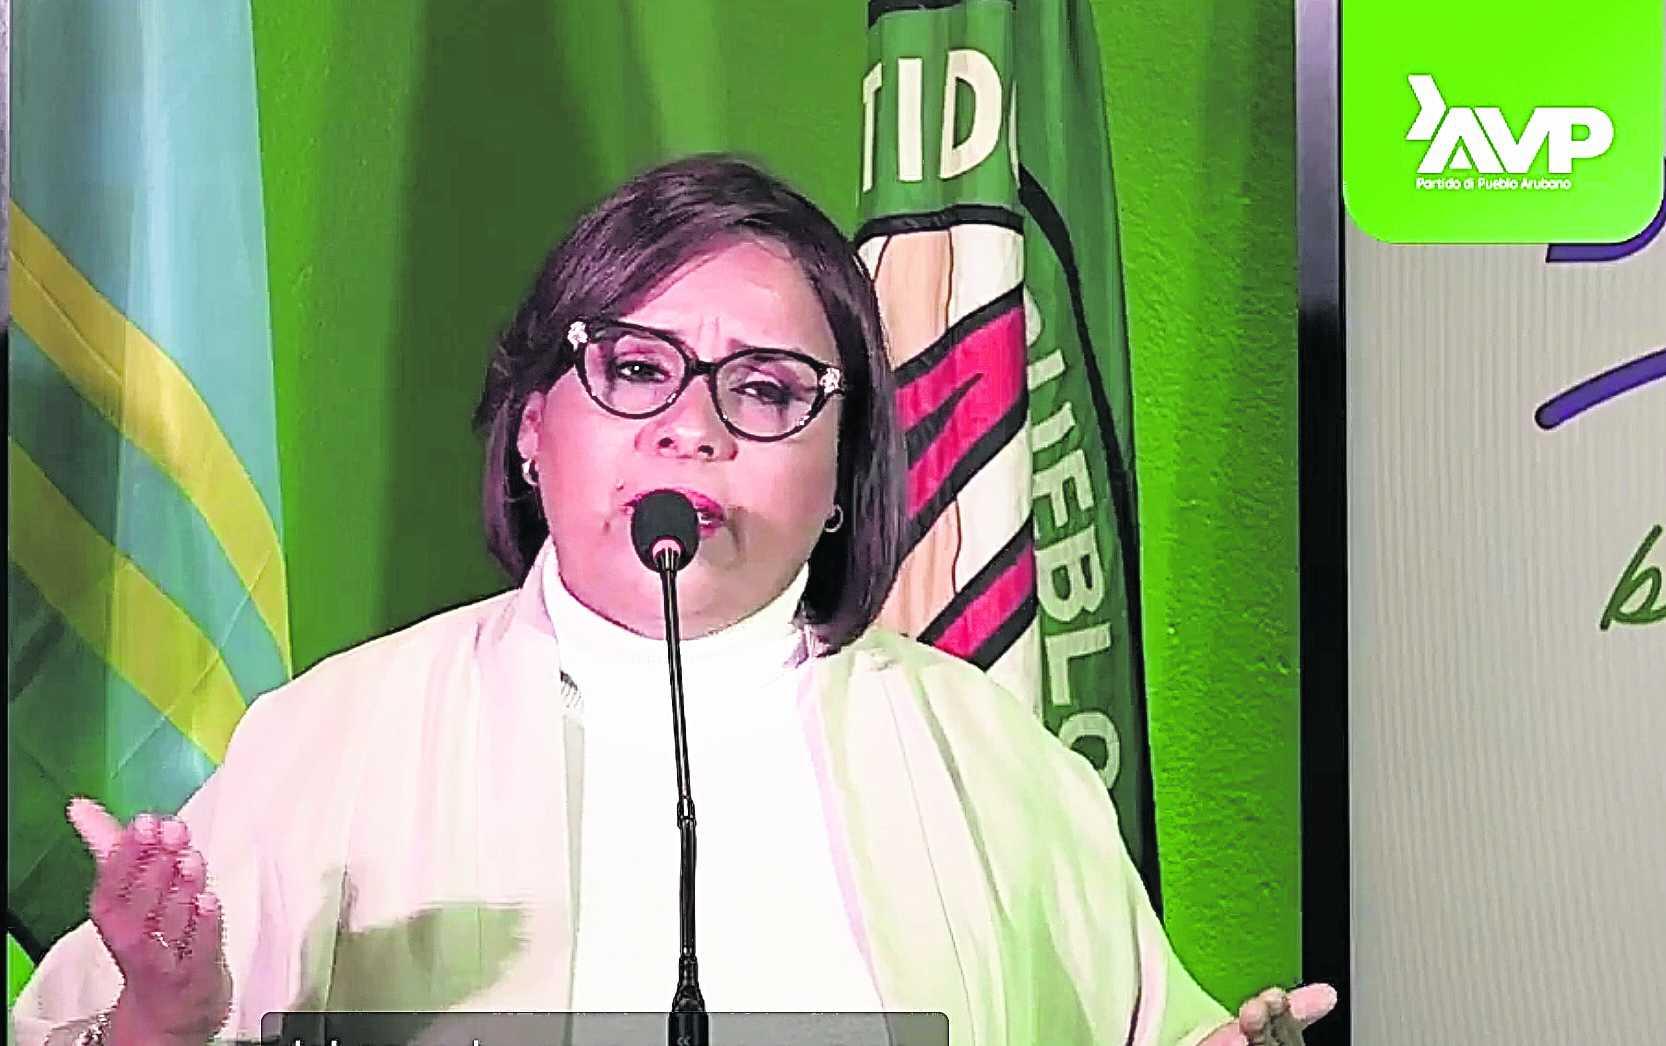 Dr. Selene Kock: Cuido di salud ta funciona no danki na gobierno, pero apesar di gobierno